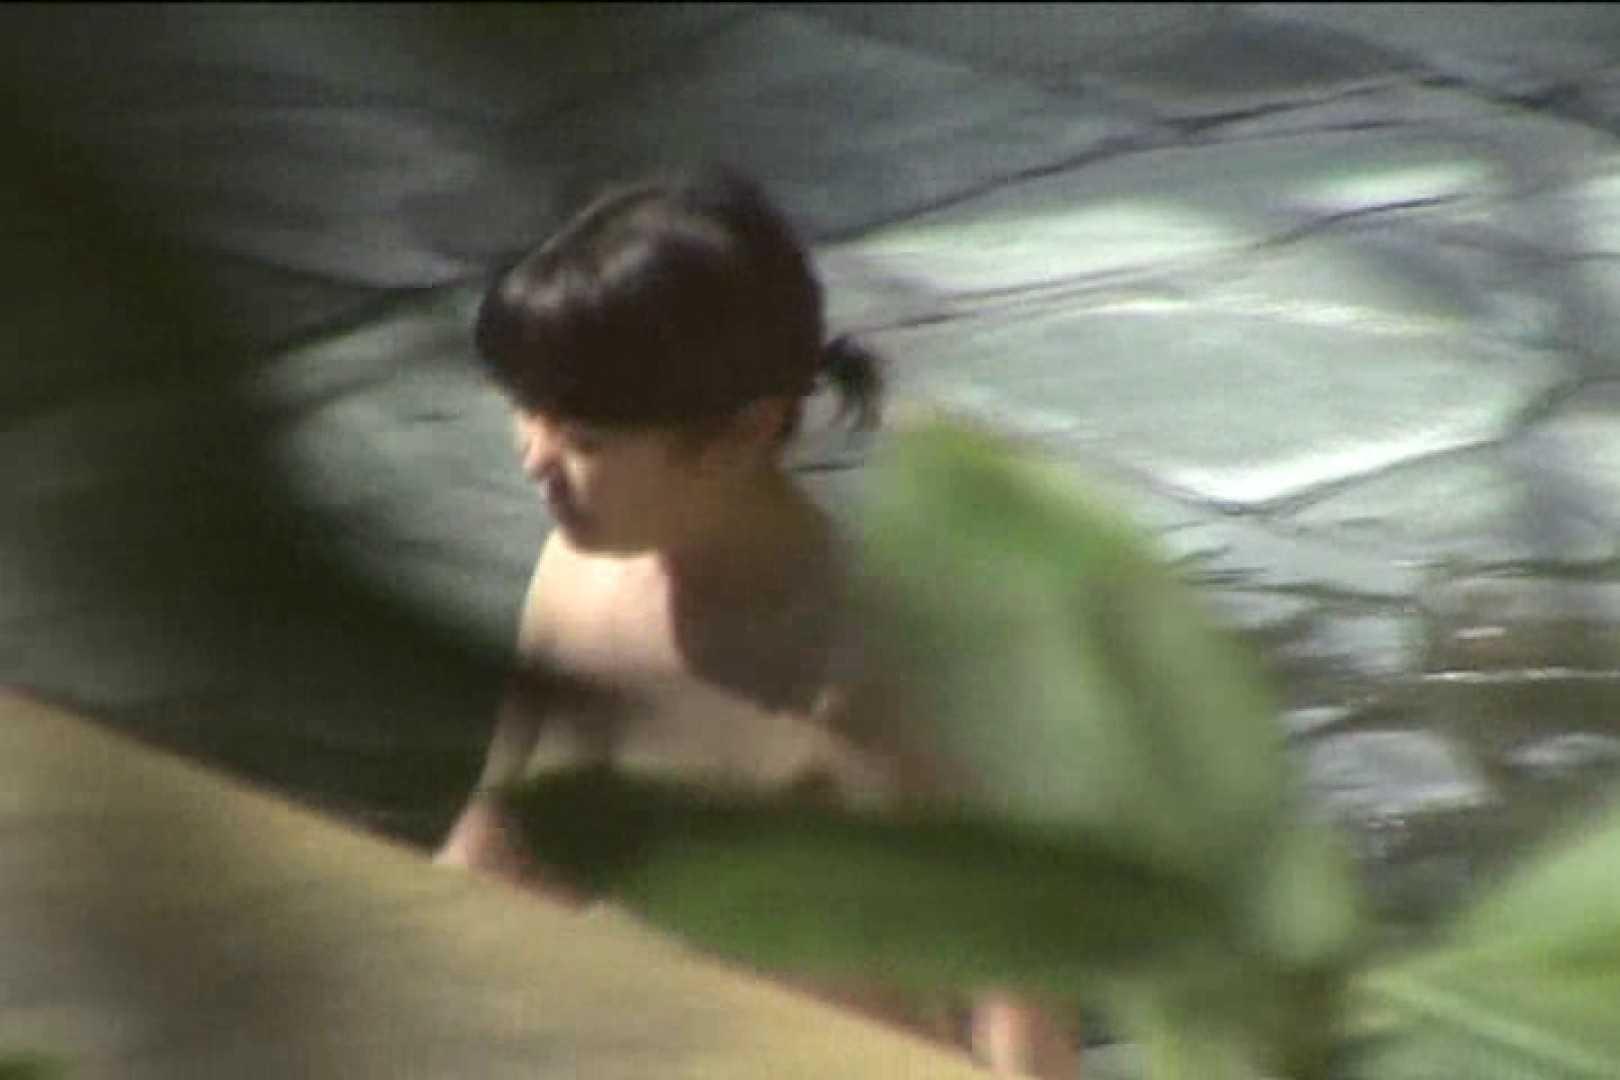 Aquaな露天風呂Vol.451 露天 オメコ無修正動画無料 66画像 38